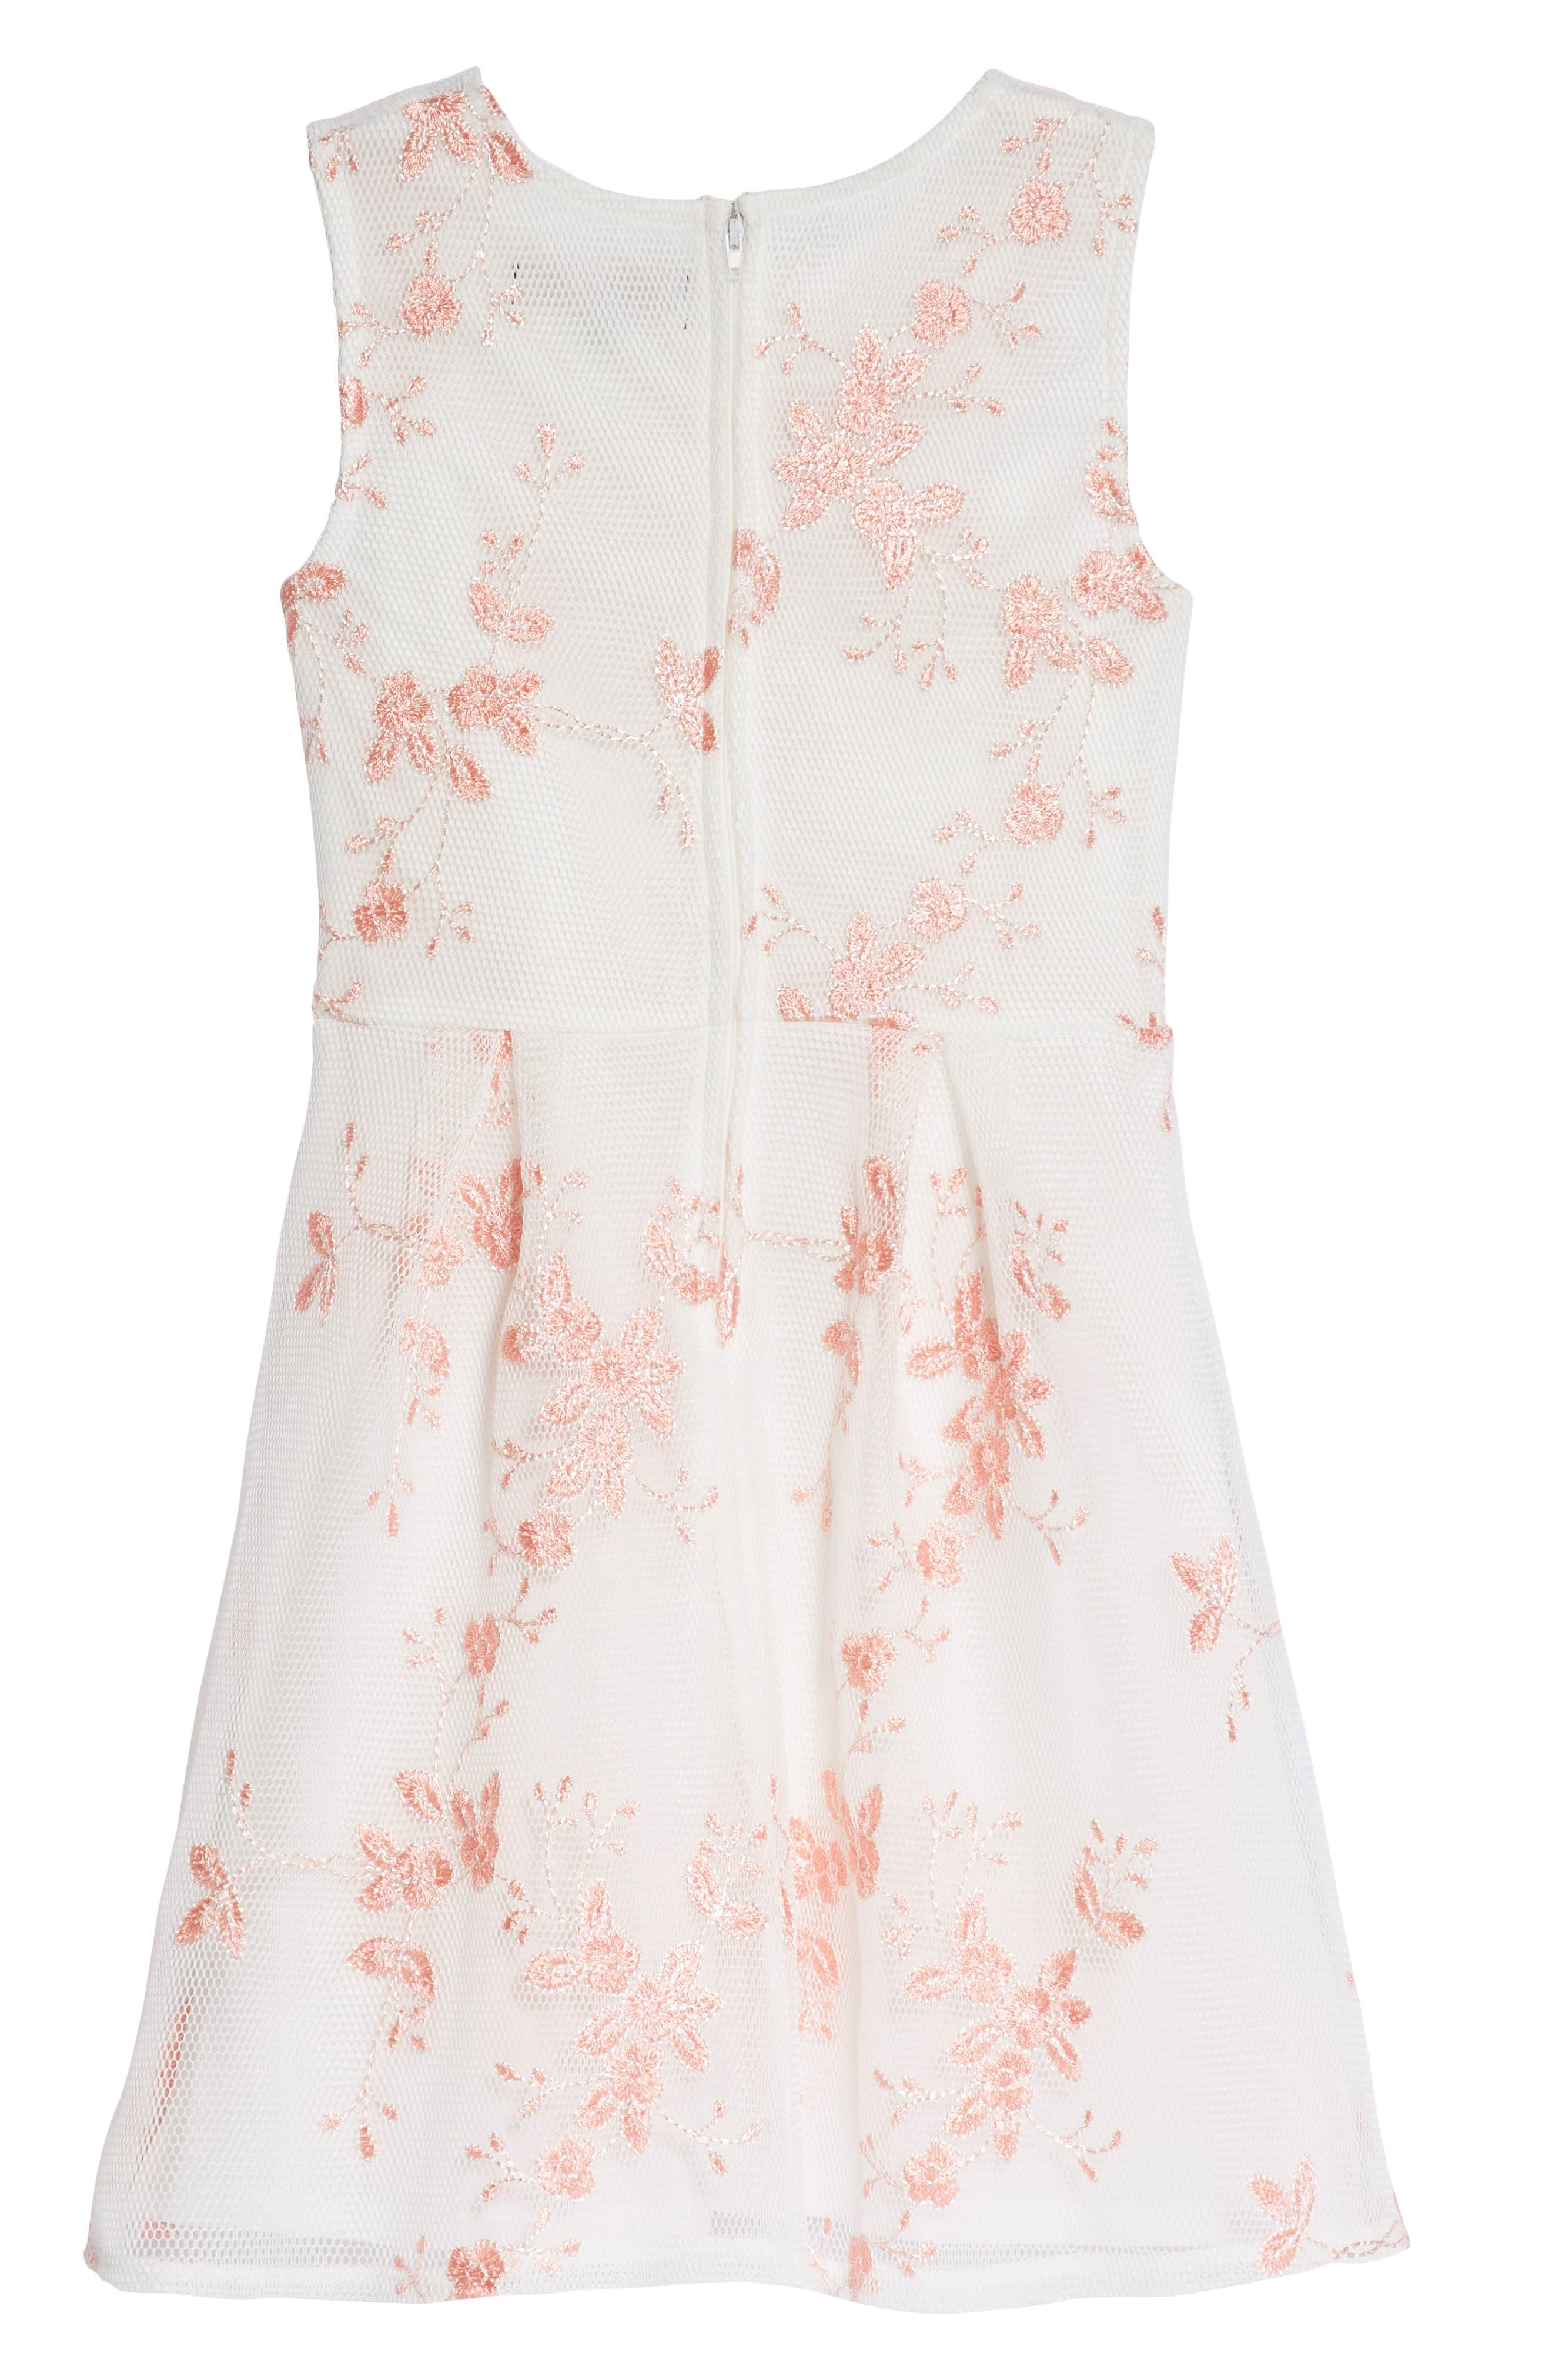 Embroidered Mesh Skater Dress,                             Alternate thumbnail 2, color,                             White/ Coral